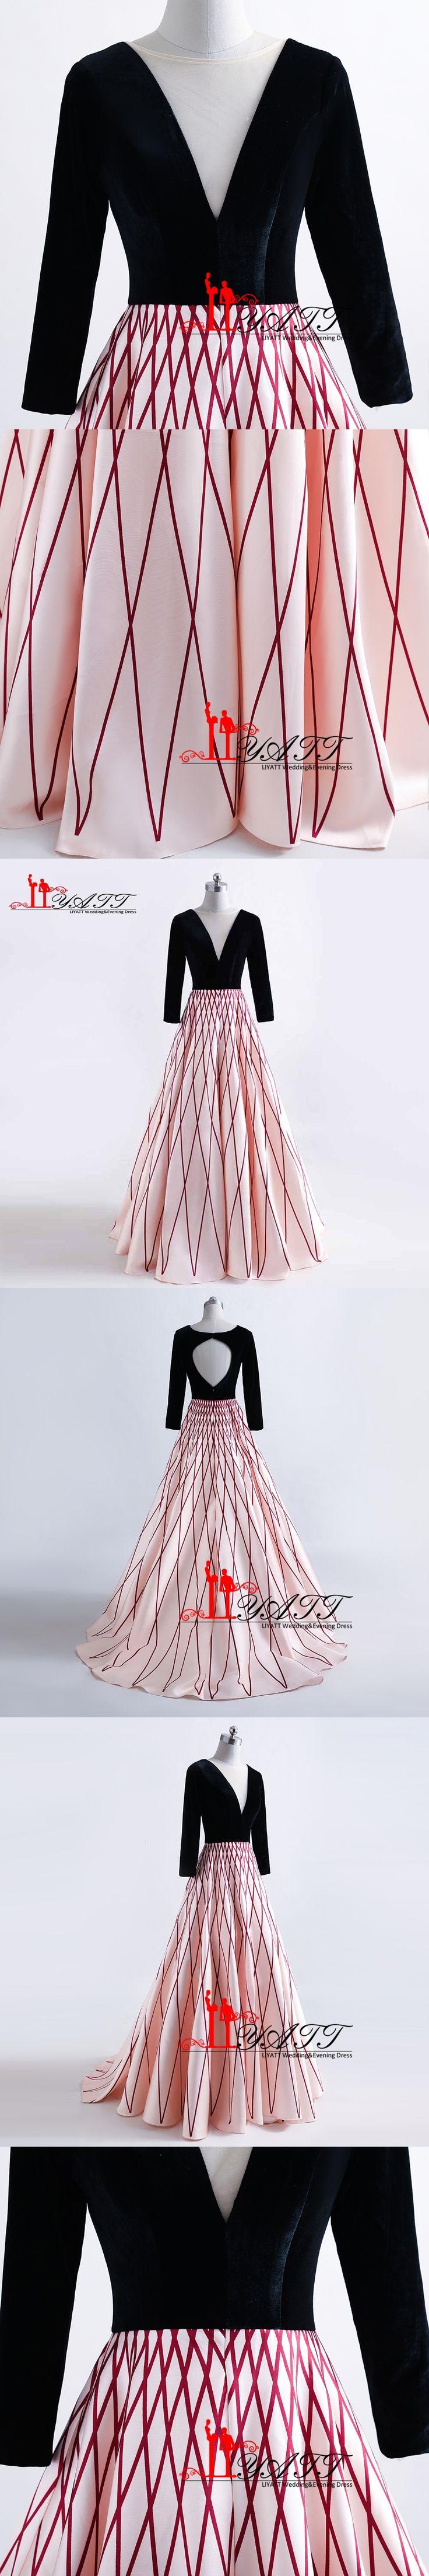 Long Sleeves Pattern Prom Dresses Printed Long Evening Party Dress V-Neck Evening Gowns Vestidos De Festa